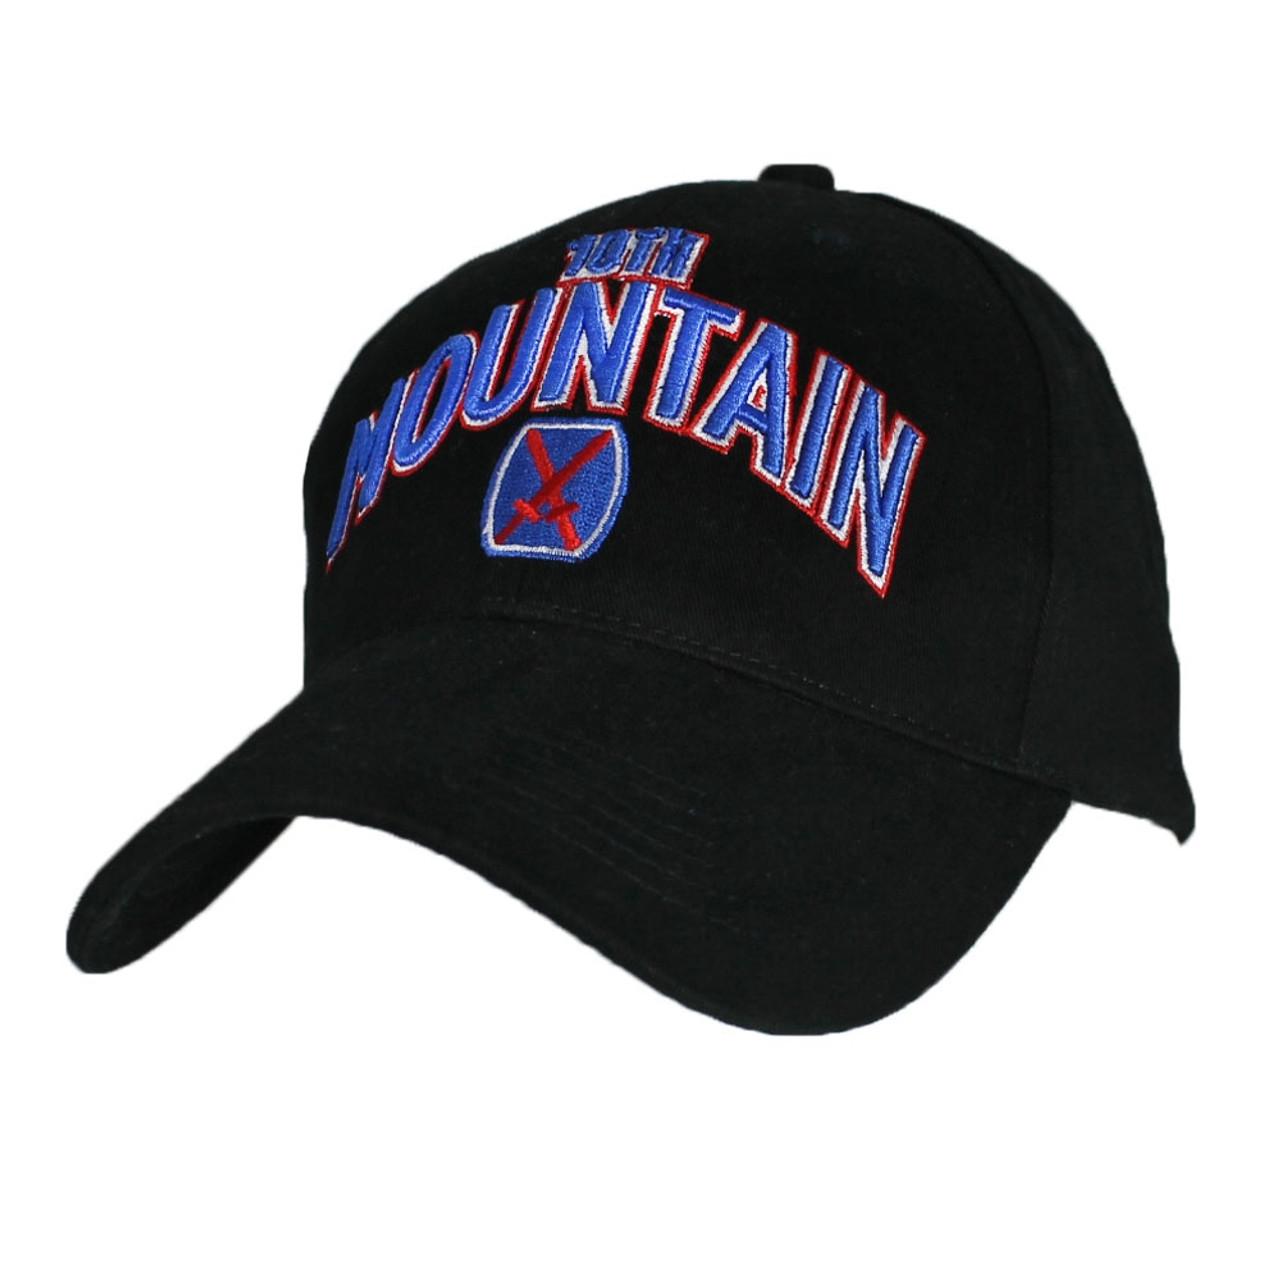 14a58f18a08 US ARMY 10th MOUNTAIN Division - U.S. Army Black Military Baseball Cap Hat